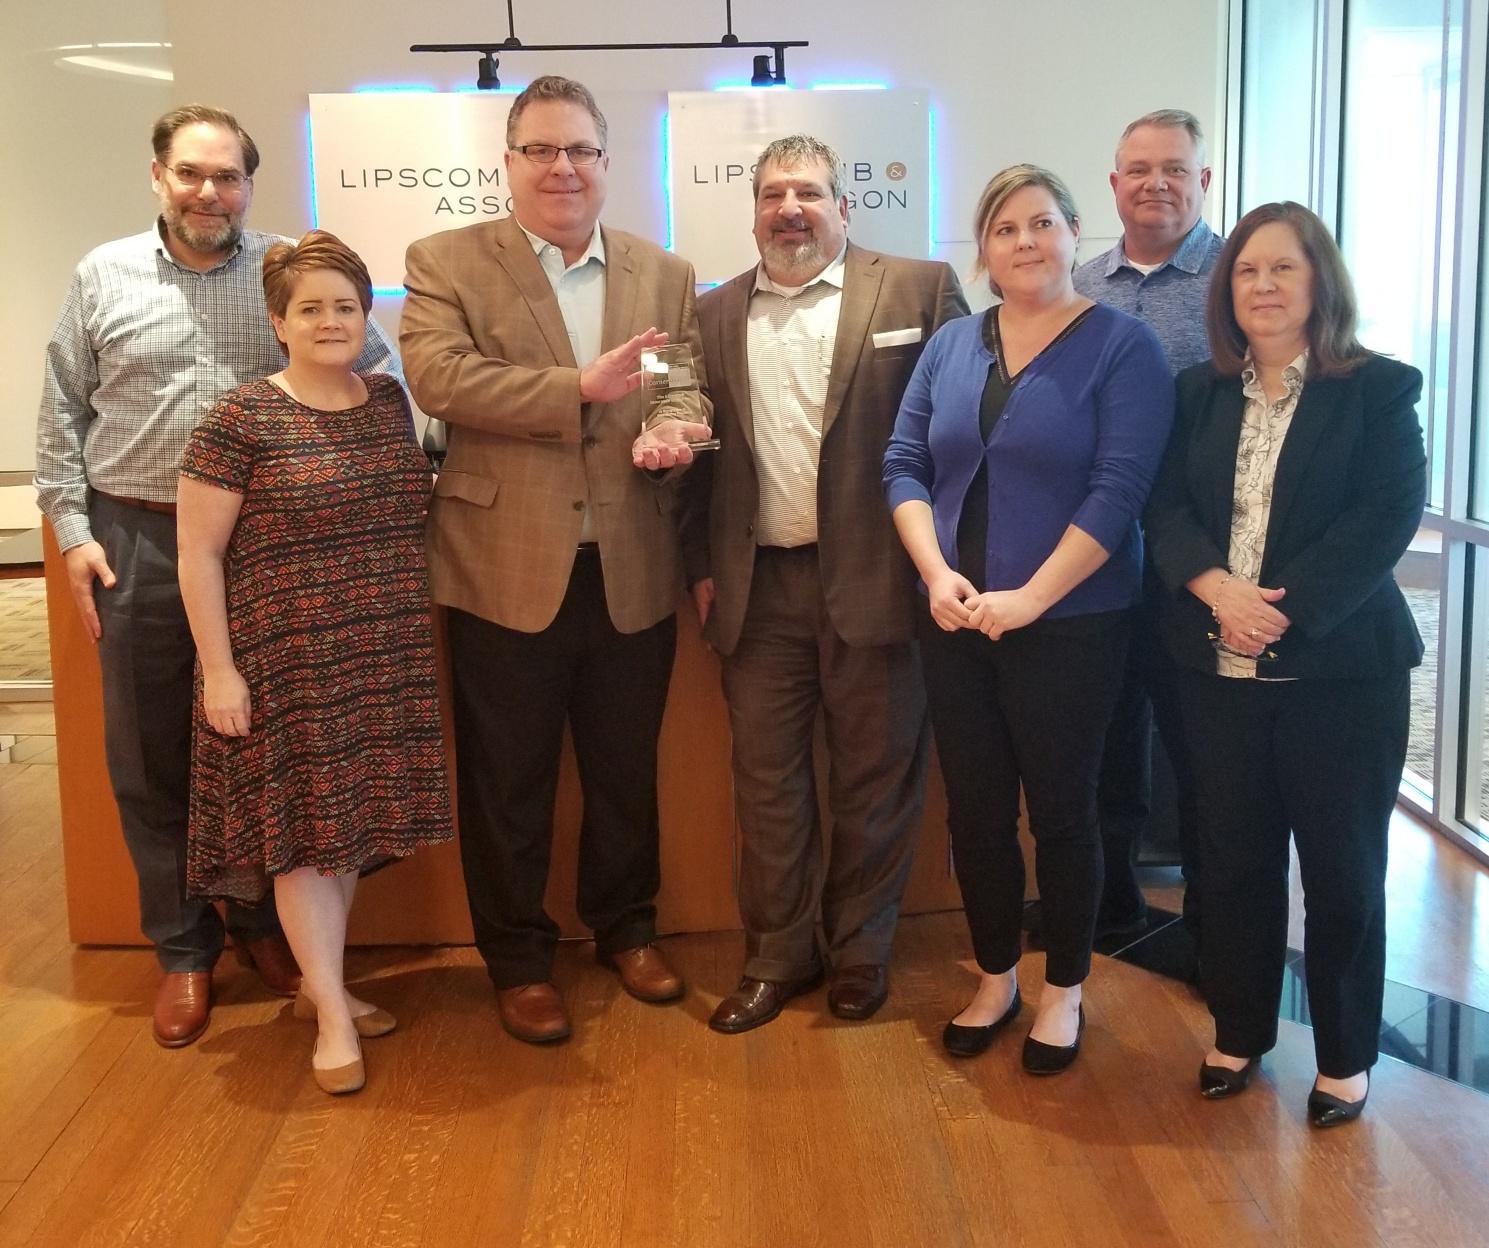 2018-lipscomb-insurance-group-cornerstone-designation-by-chubb